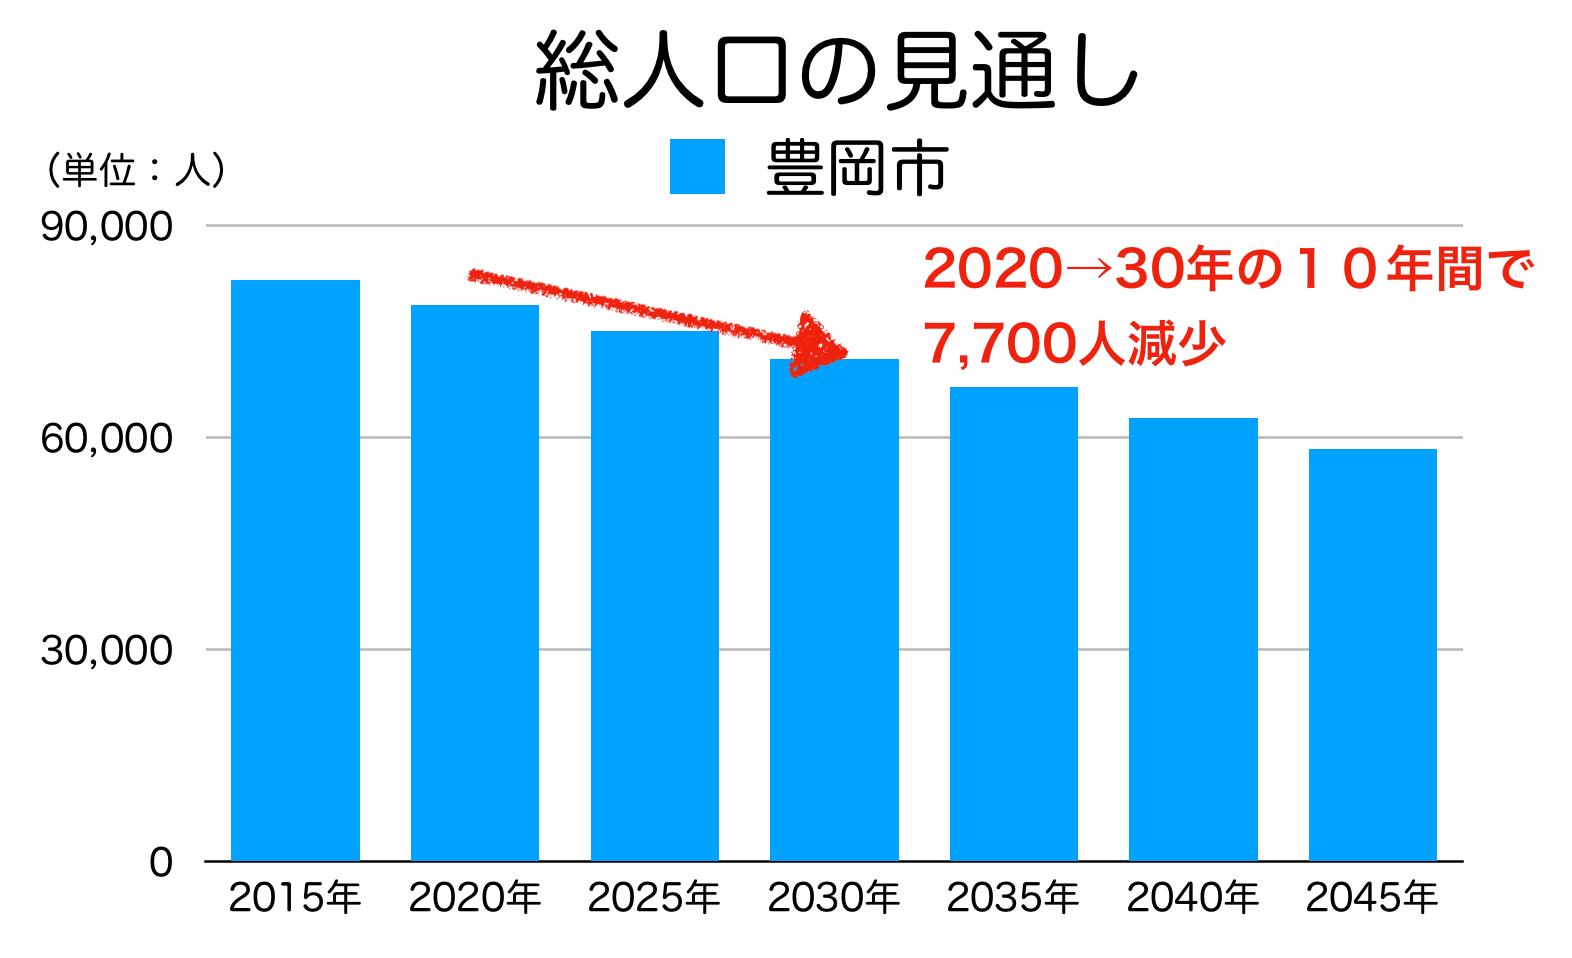 豊岡市の人口予測